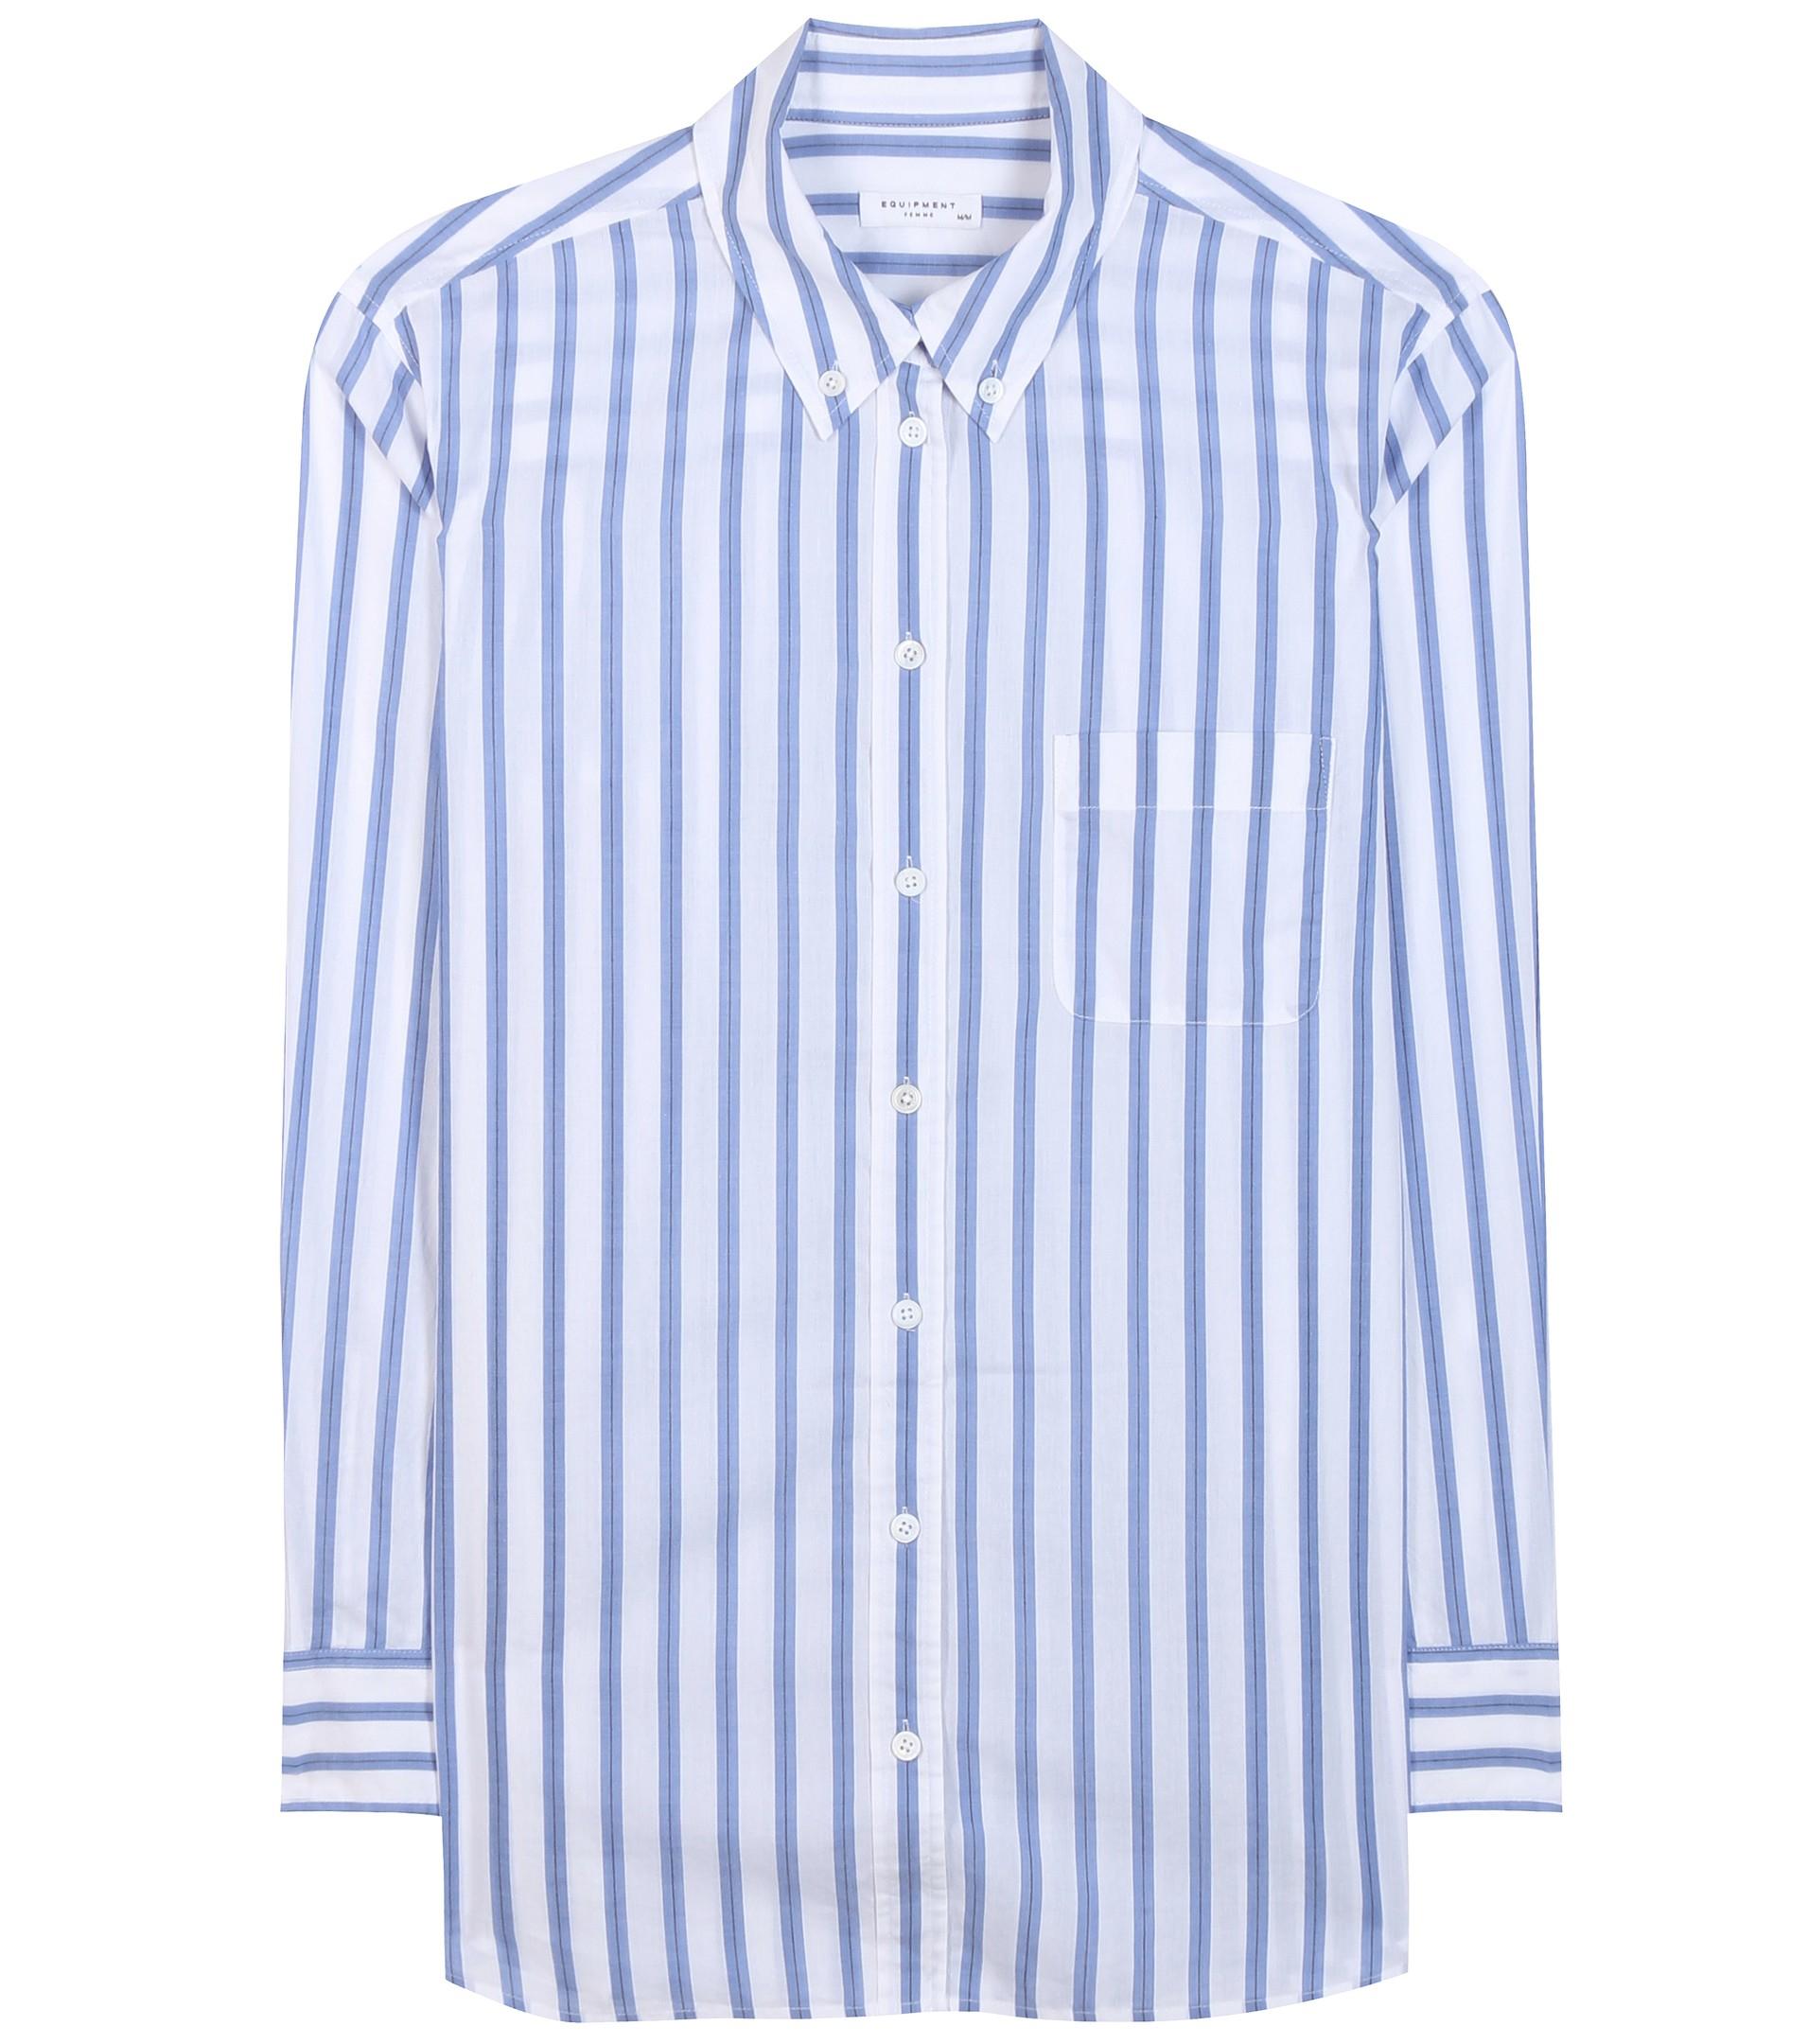 72f8ffad53e64 Equipment Margaux Striped Cotton Shirt in Blue - Lyst